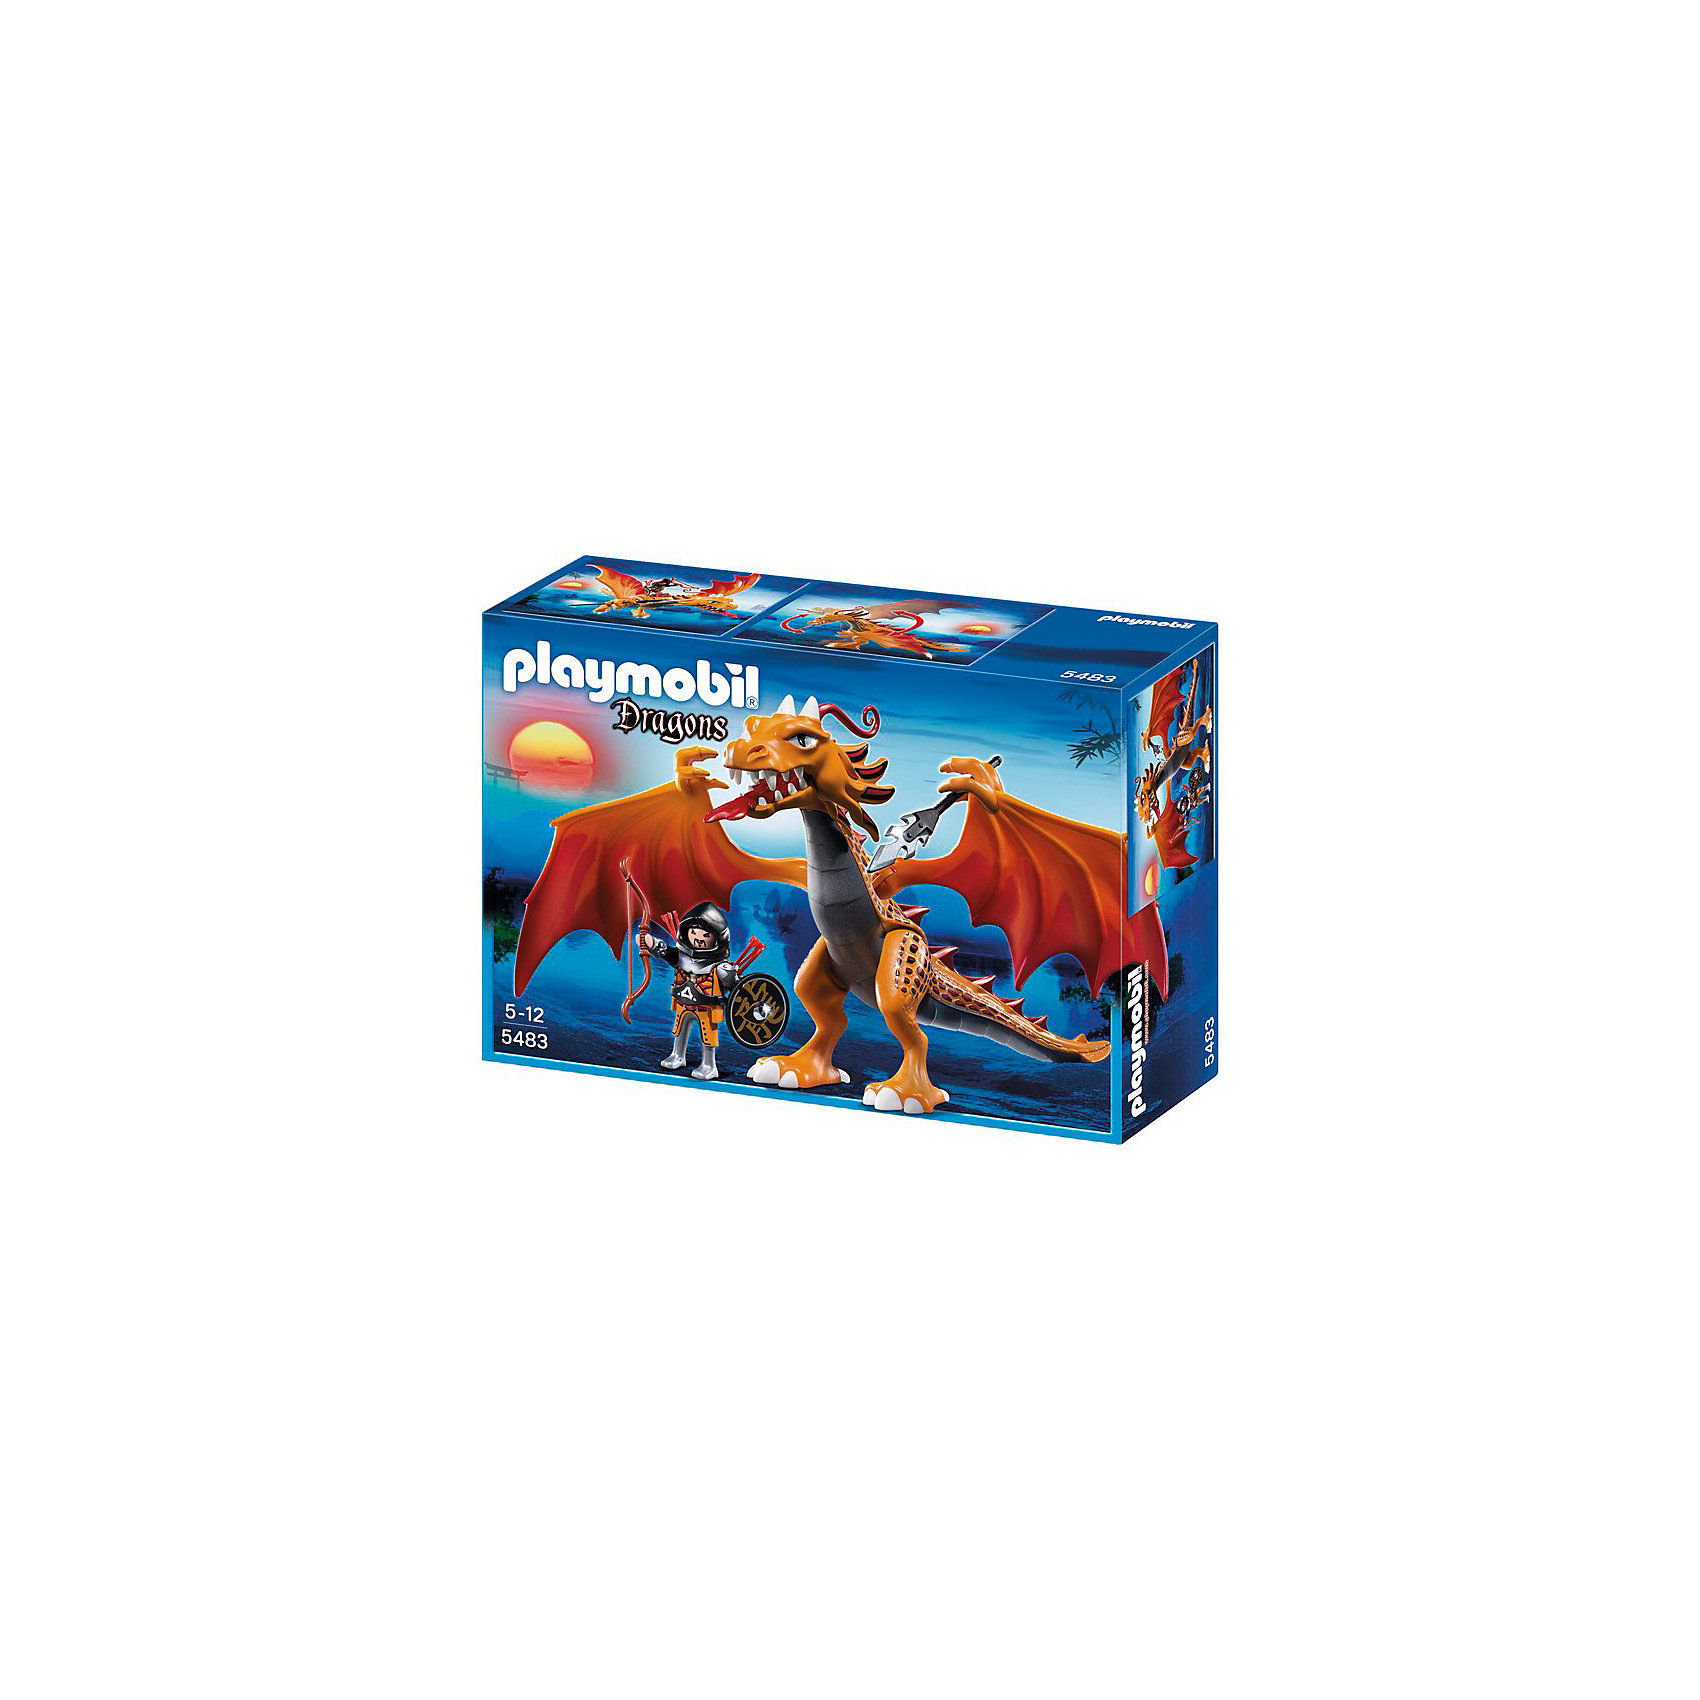 PLAYMOBIL 5483 Азиатский дракон: Огненный дракон от myToys